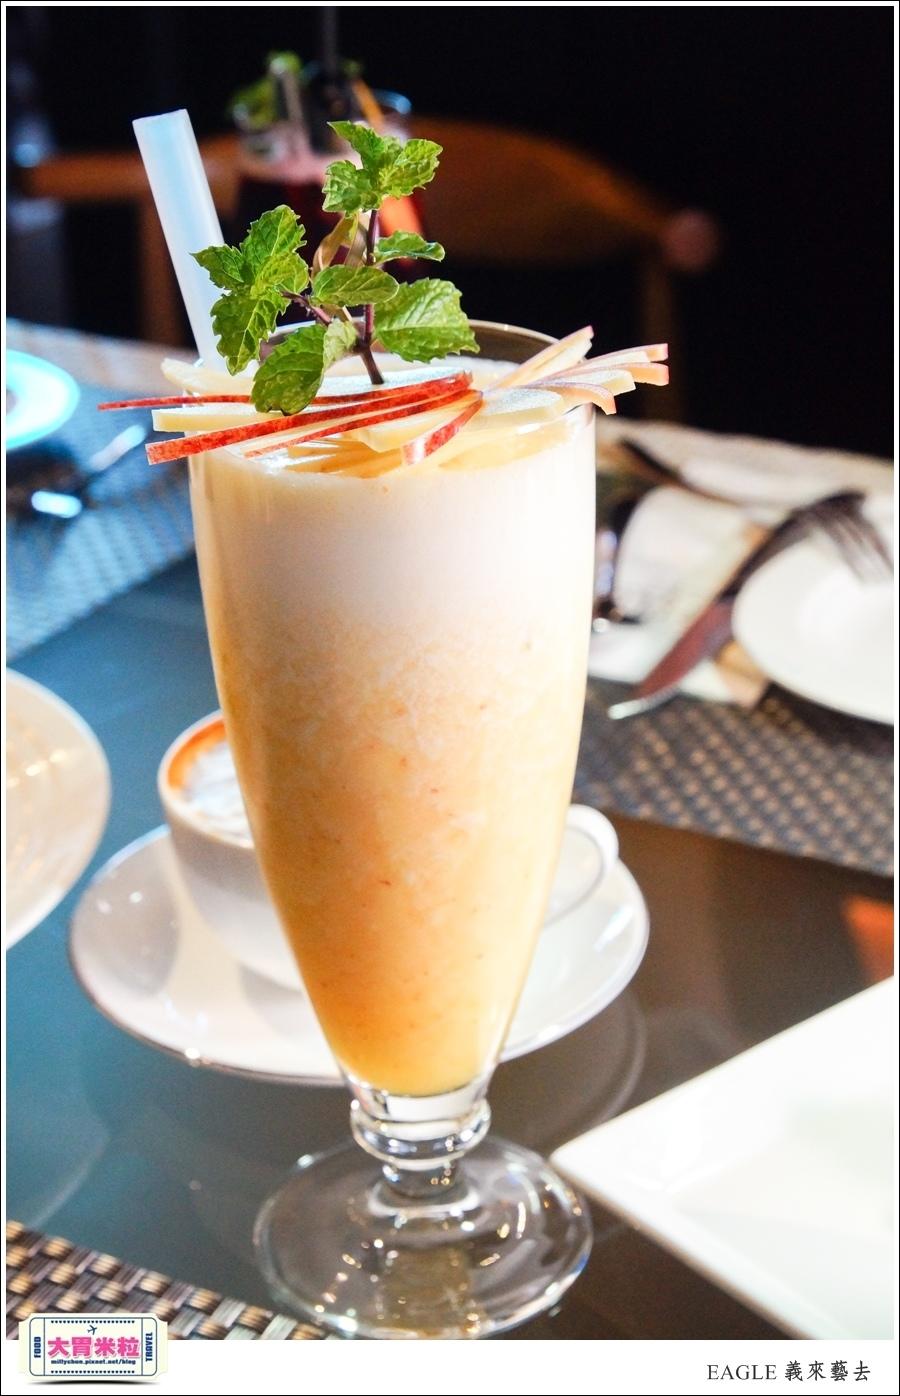 Hellmann's 康寶美玉白汁全台美味沙拉之旅xEAGLE 義來藝去義法餐廳@高雄義法餐廳推薦@大胃米粒0047.jpg